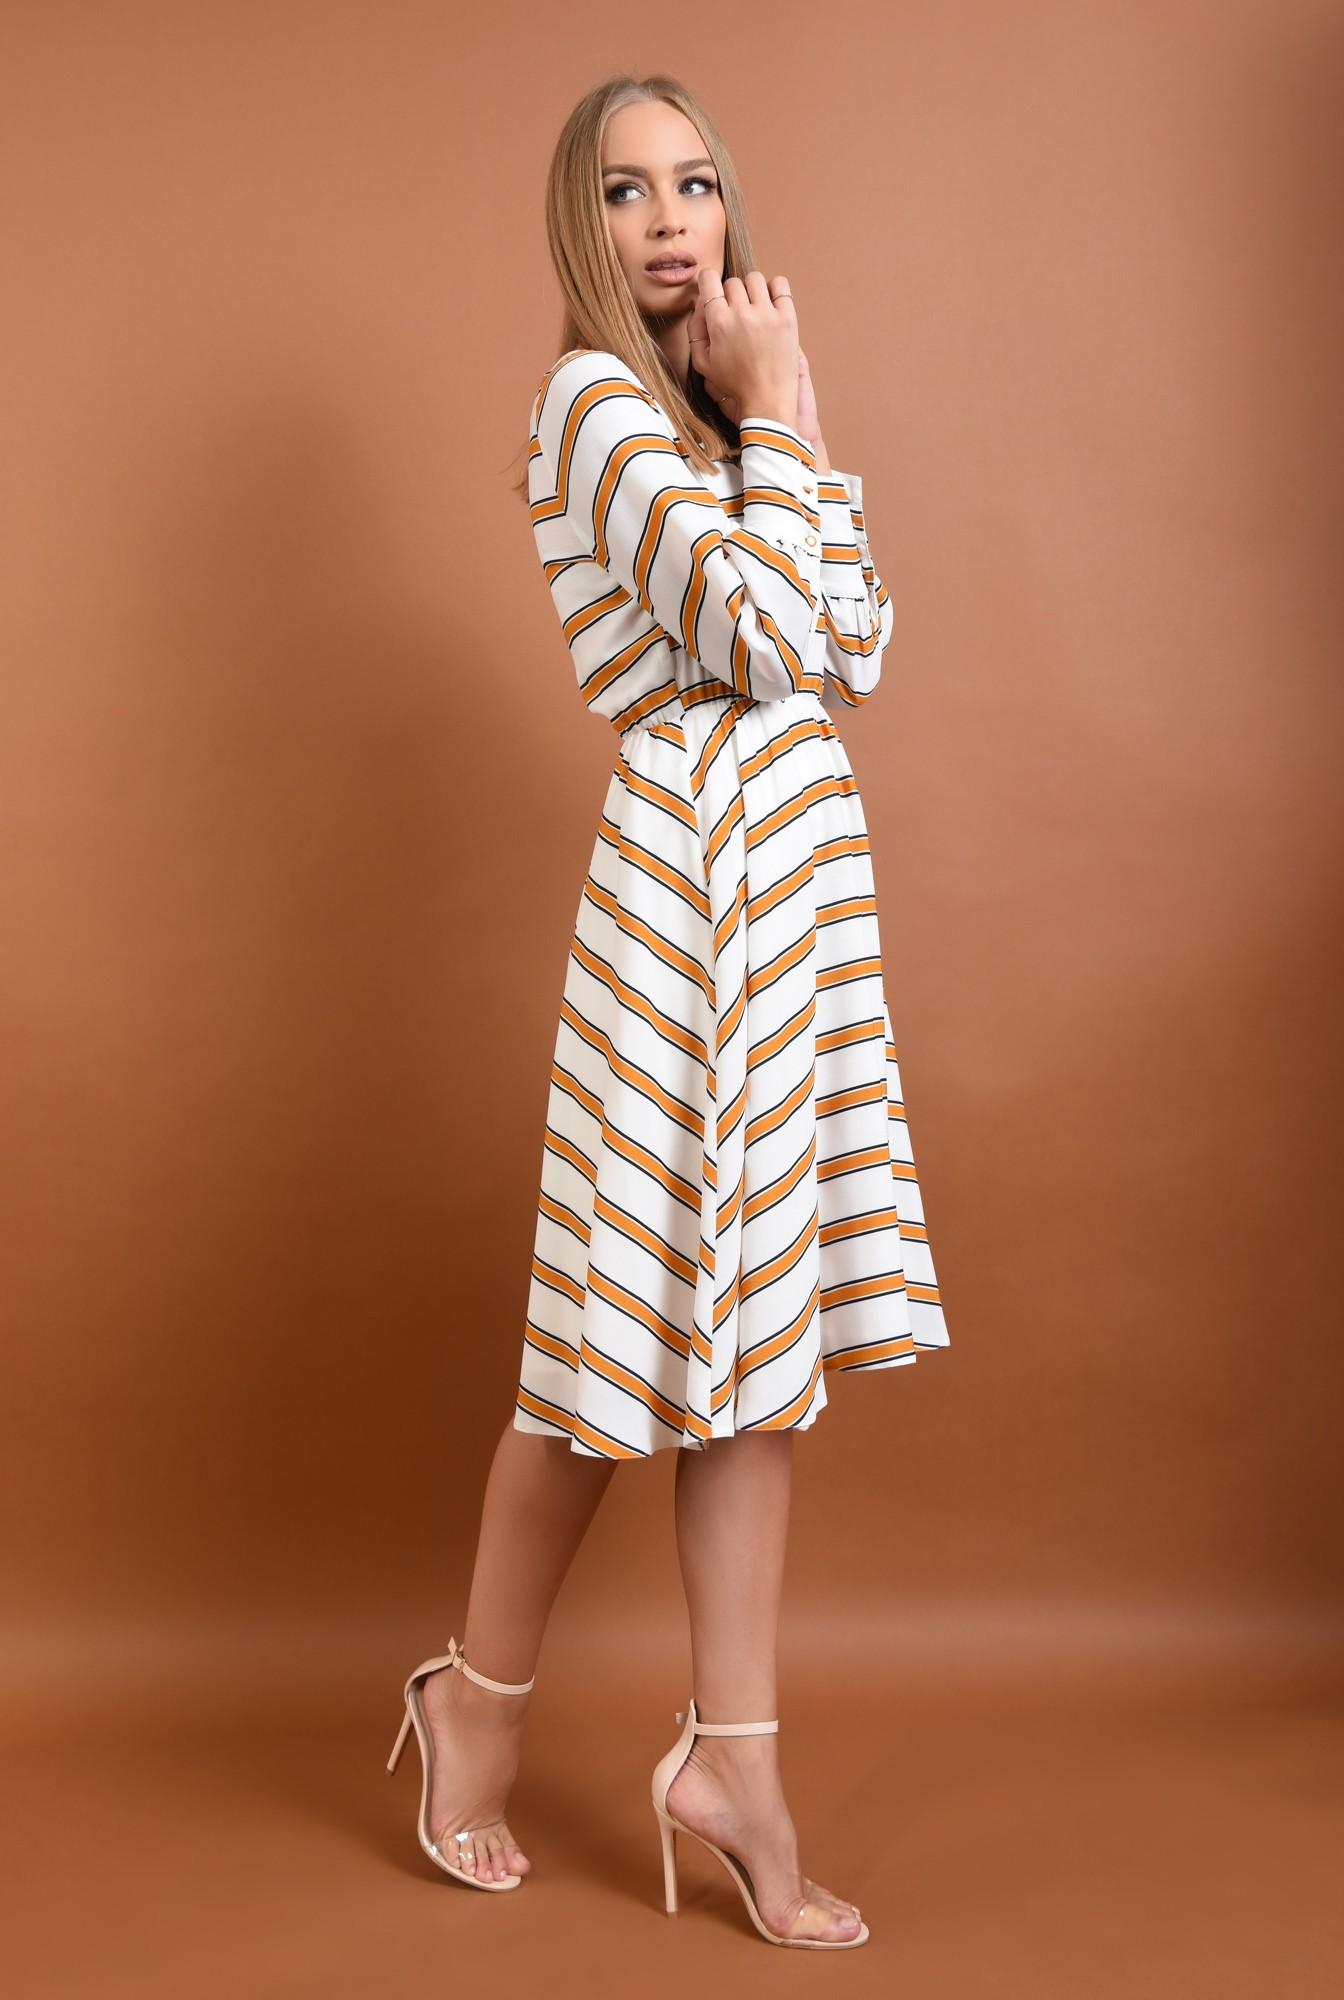 360 - rochie casual imprimata, alb, mustar, bie, cusatura in talie